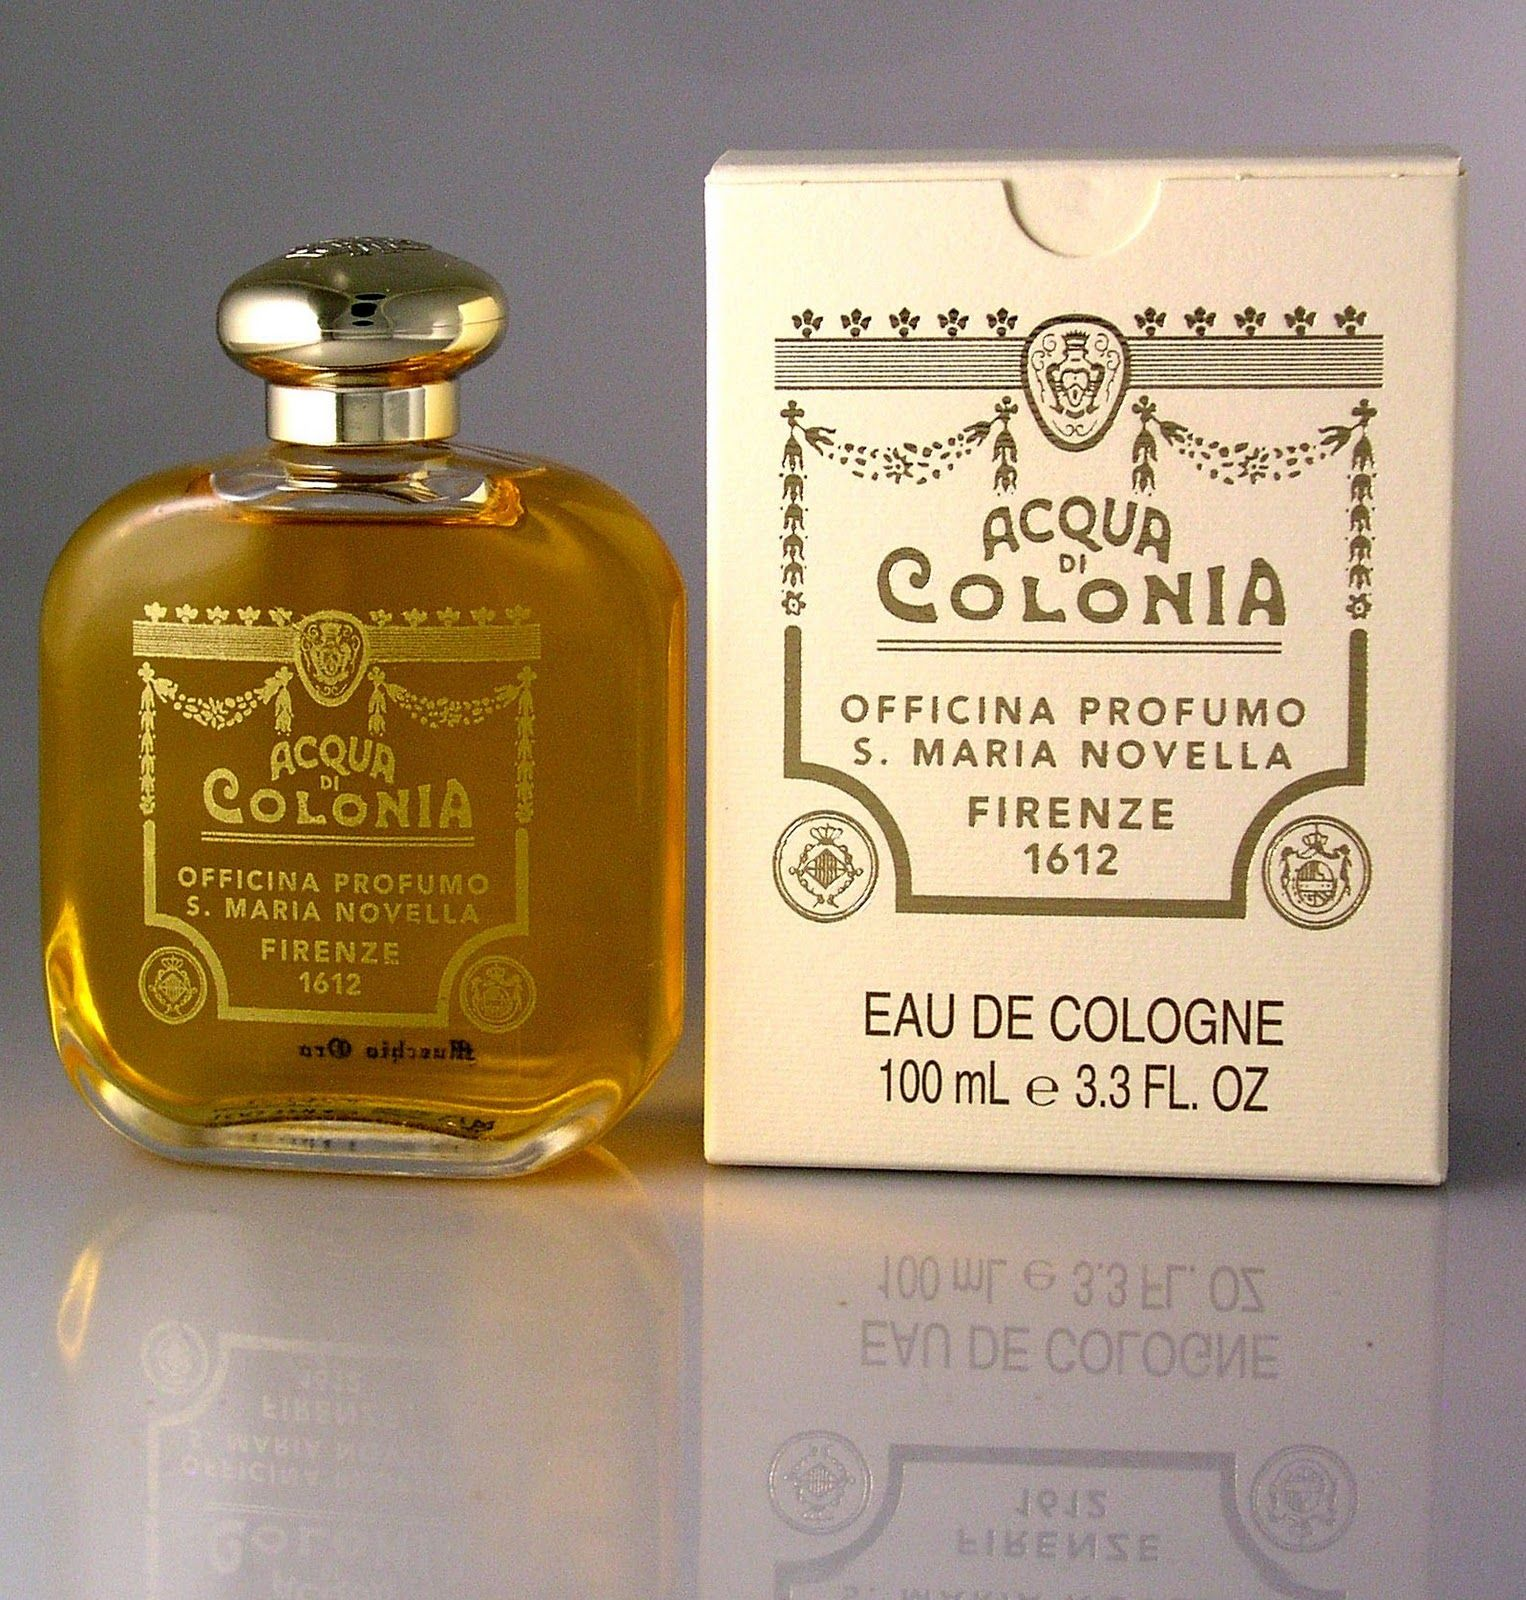 Acqua Colonia di Firenze.